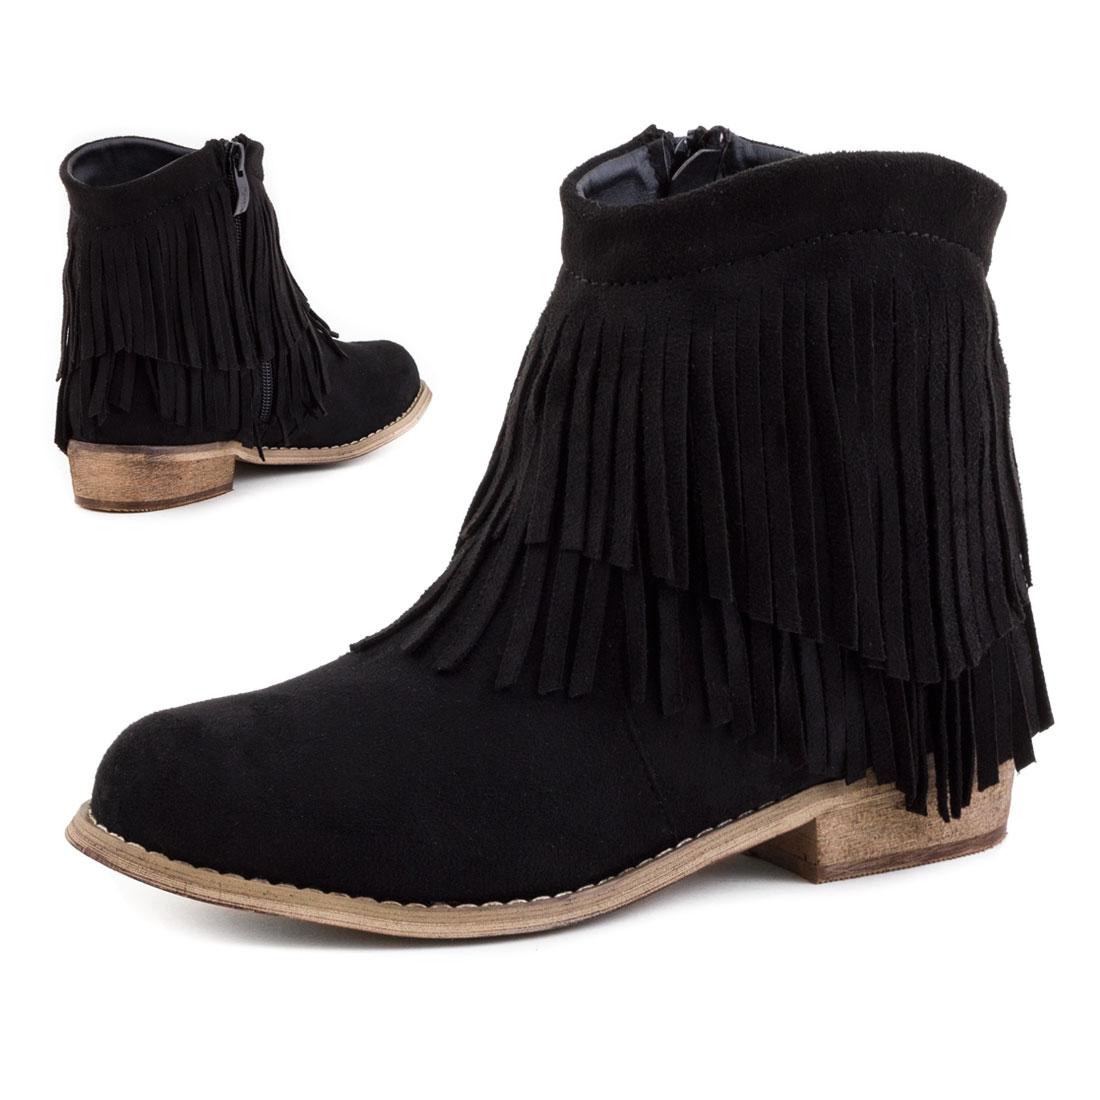 neu damen western cowboy stiefeletten fransen boots schuhe. Black Bedroom Furniture Sets. Home Design Ideas